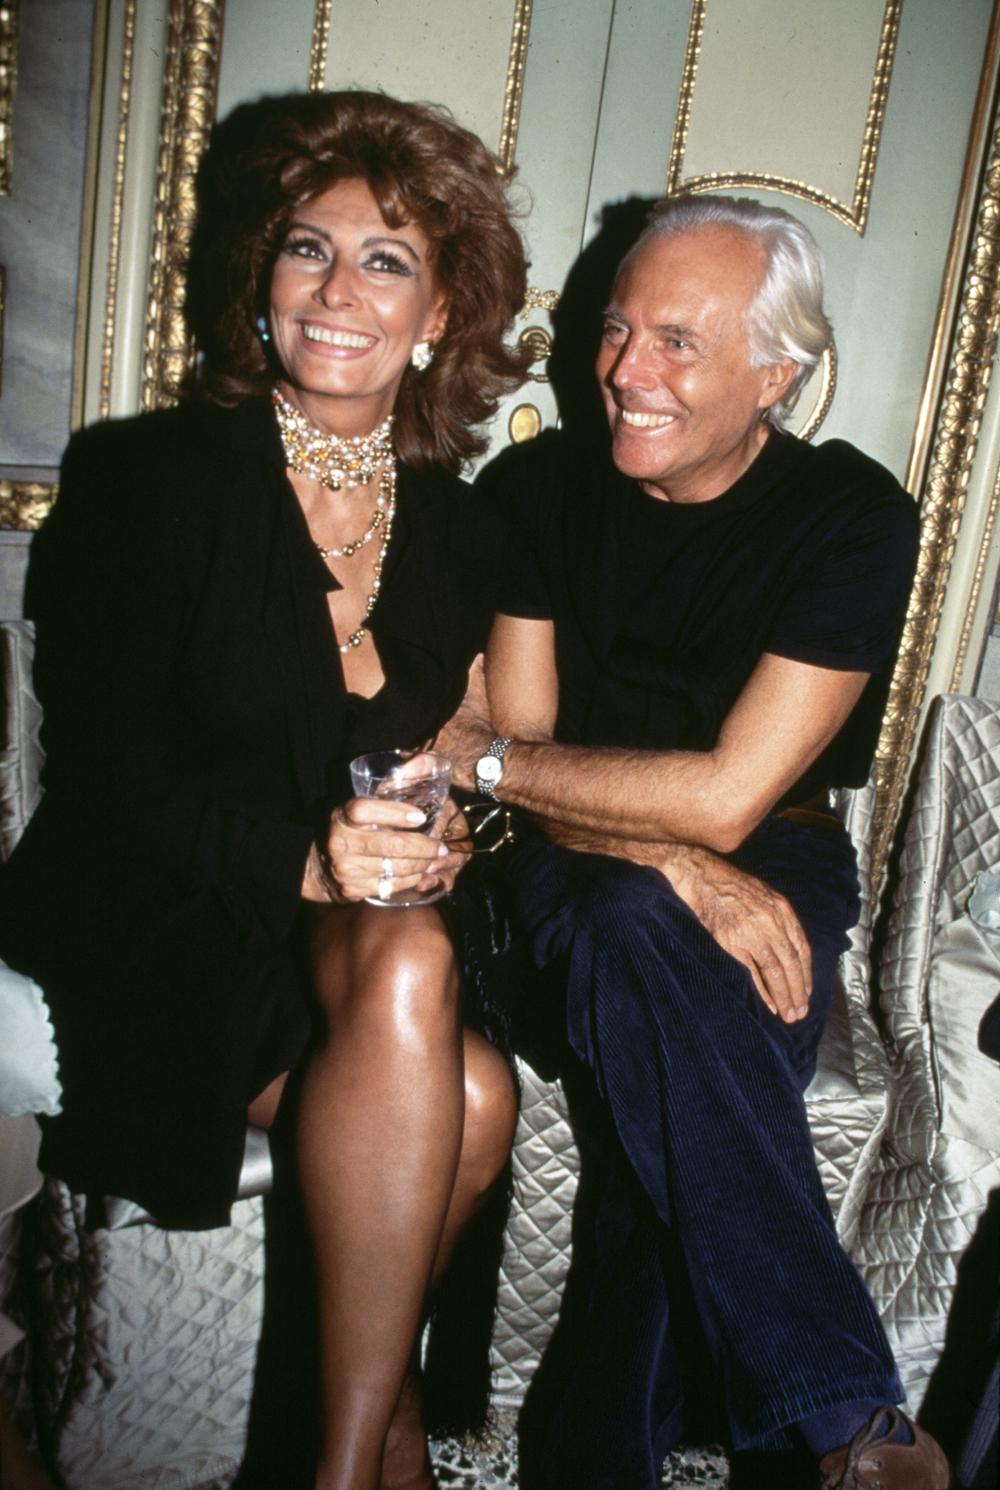 Sophia Loren and Giorgio Armani